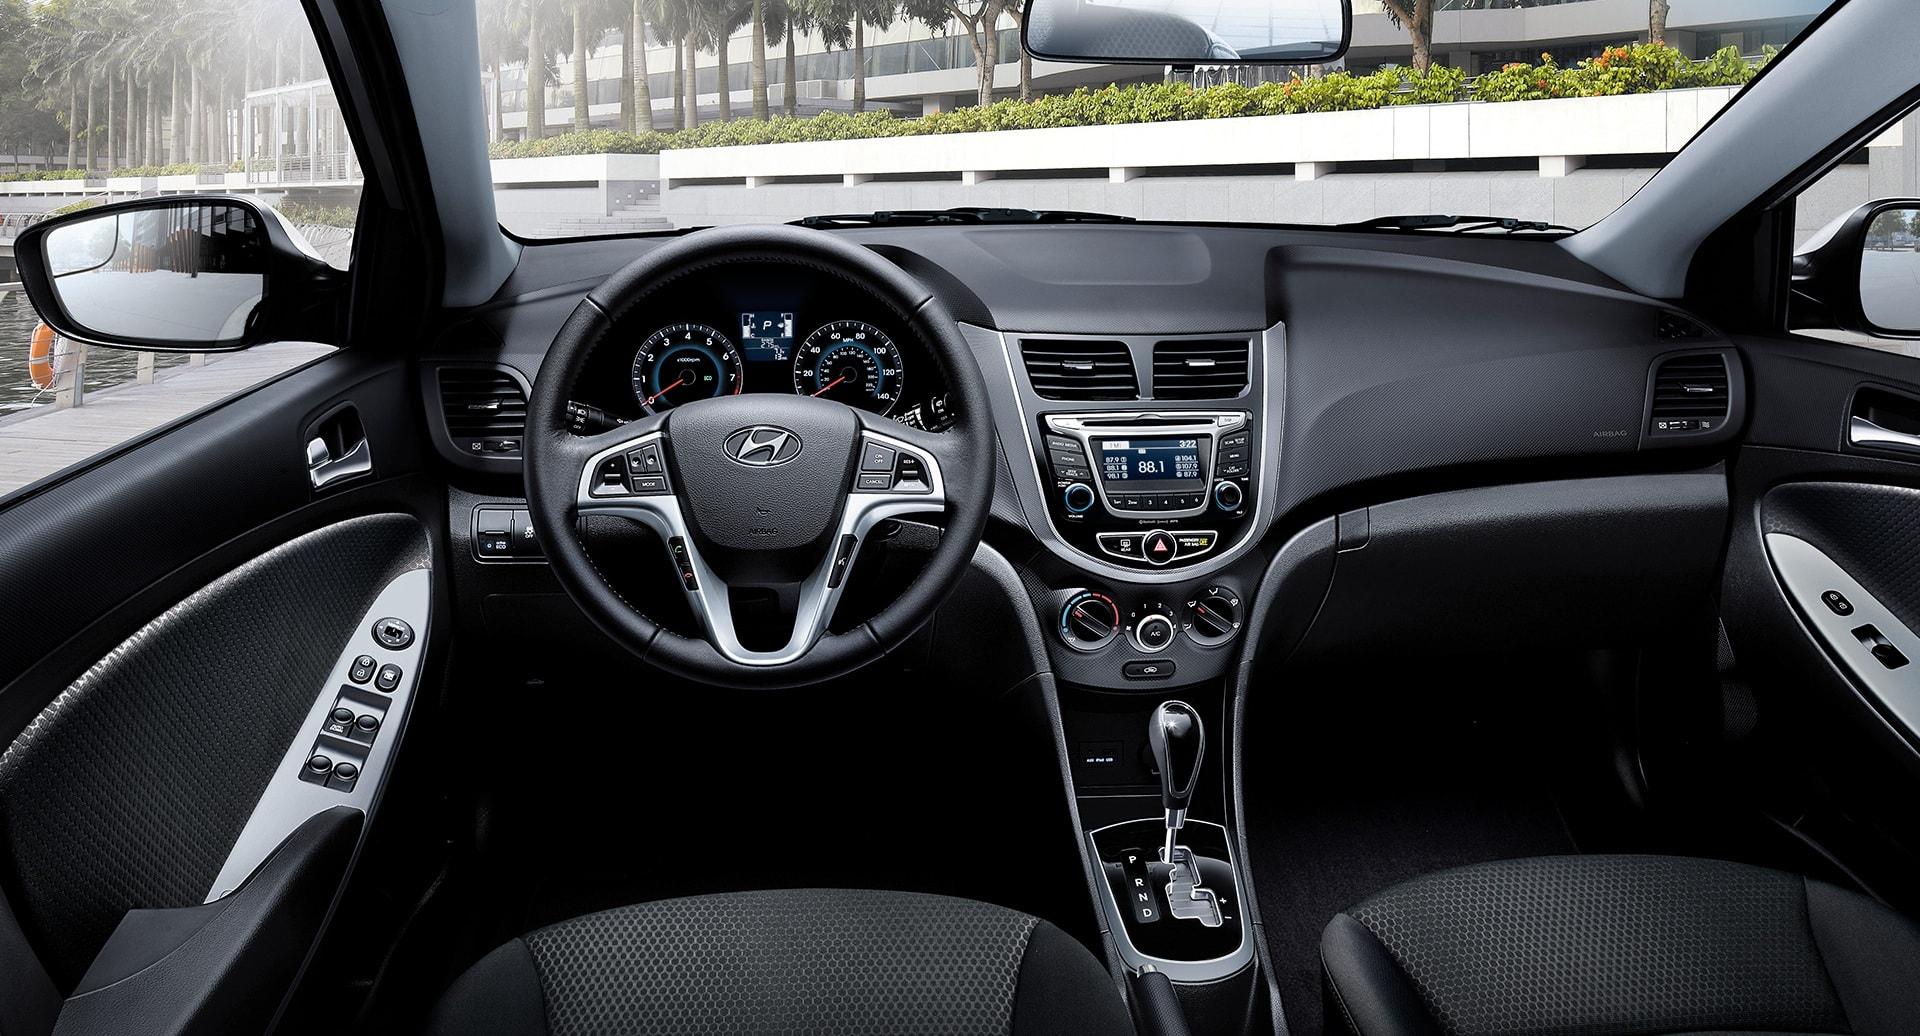 Hyundai Solaris I 2010 - 2014 Hatchback 5 door #3